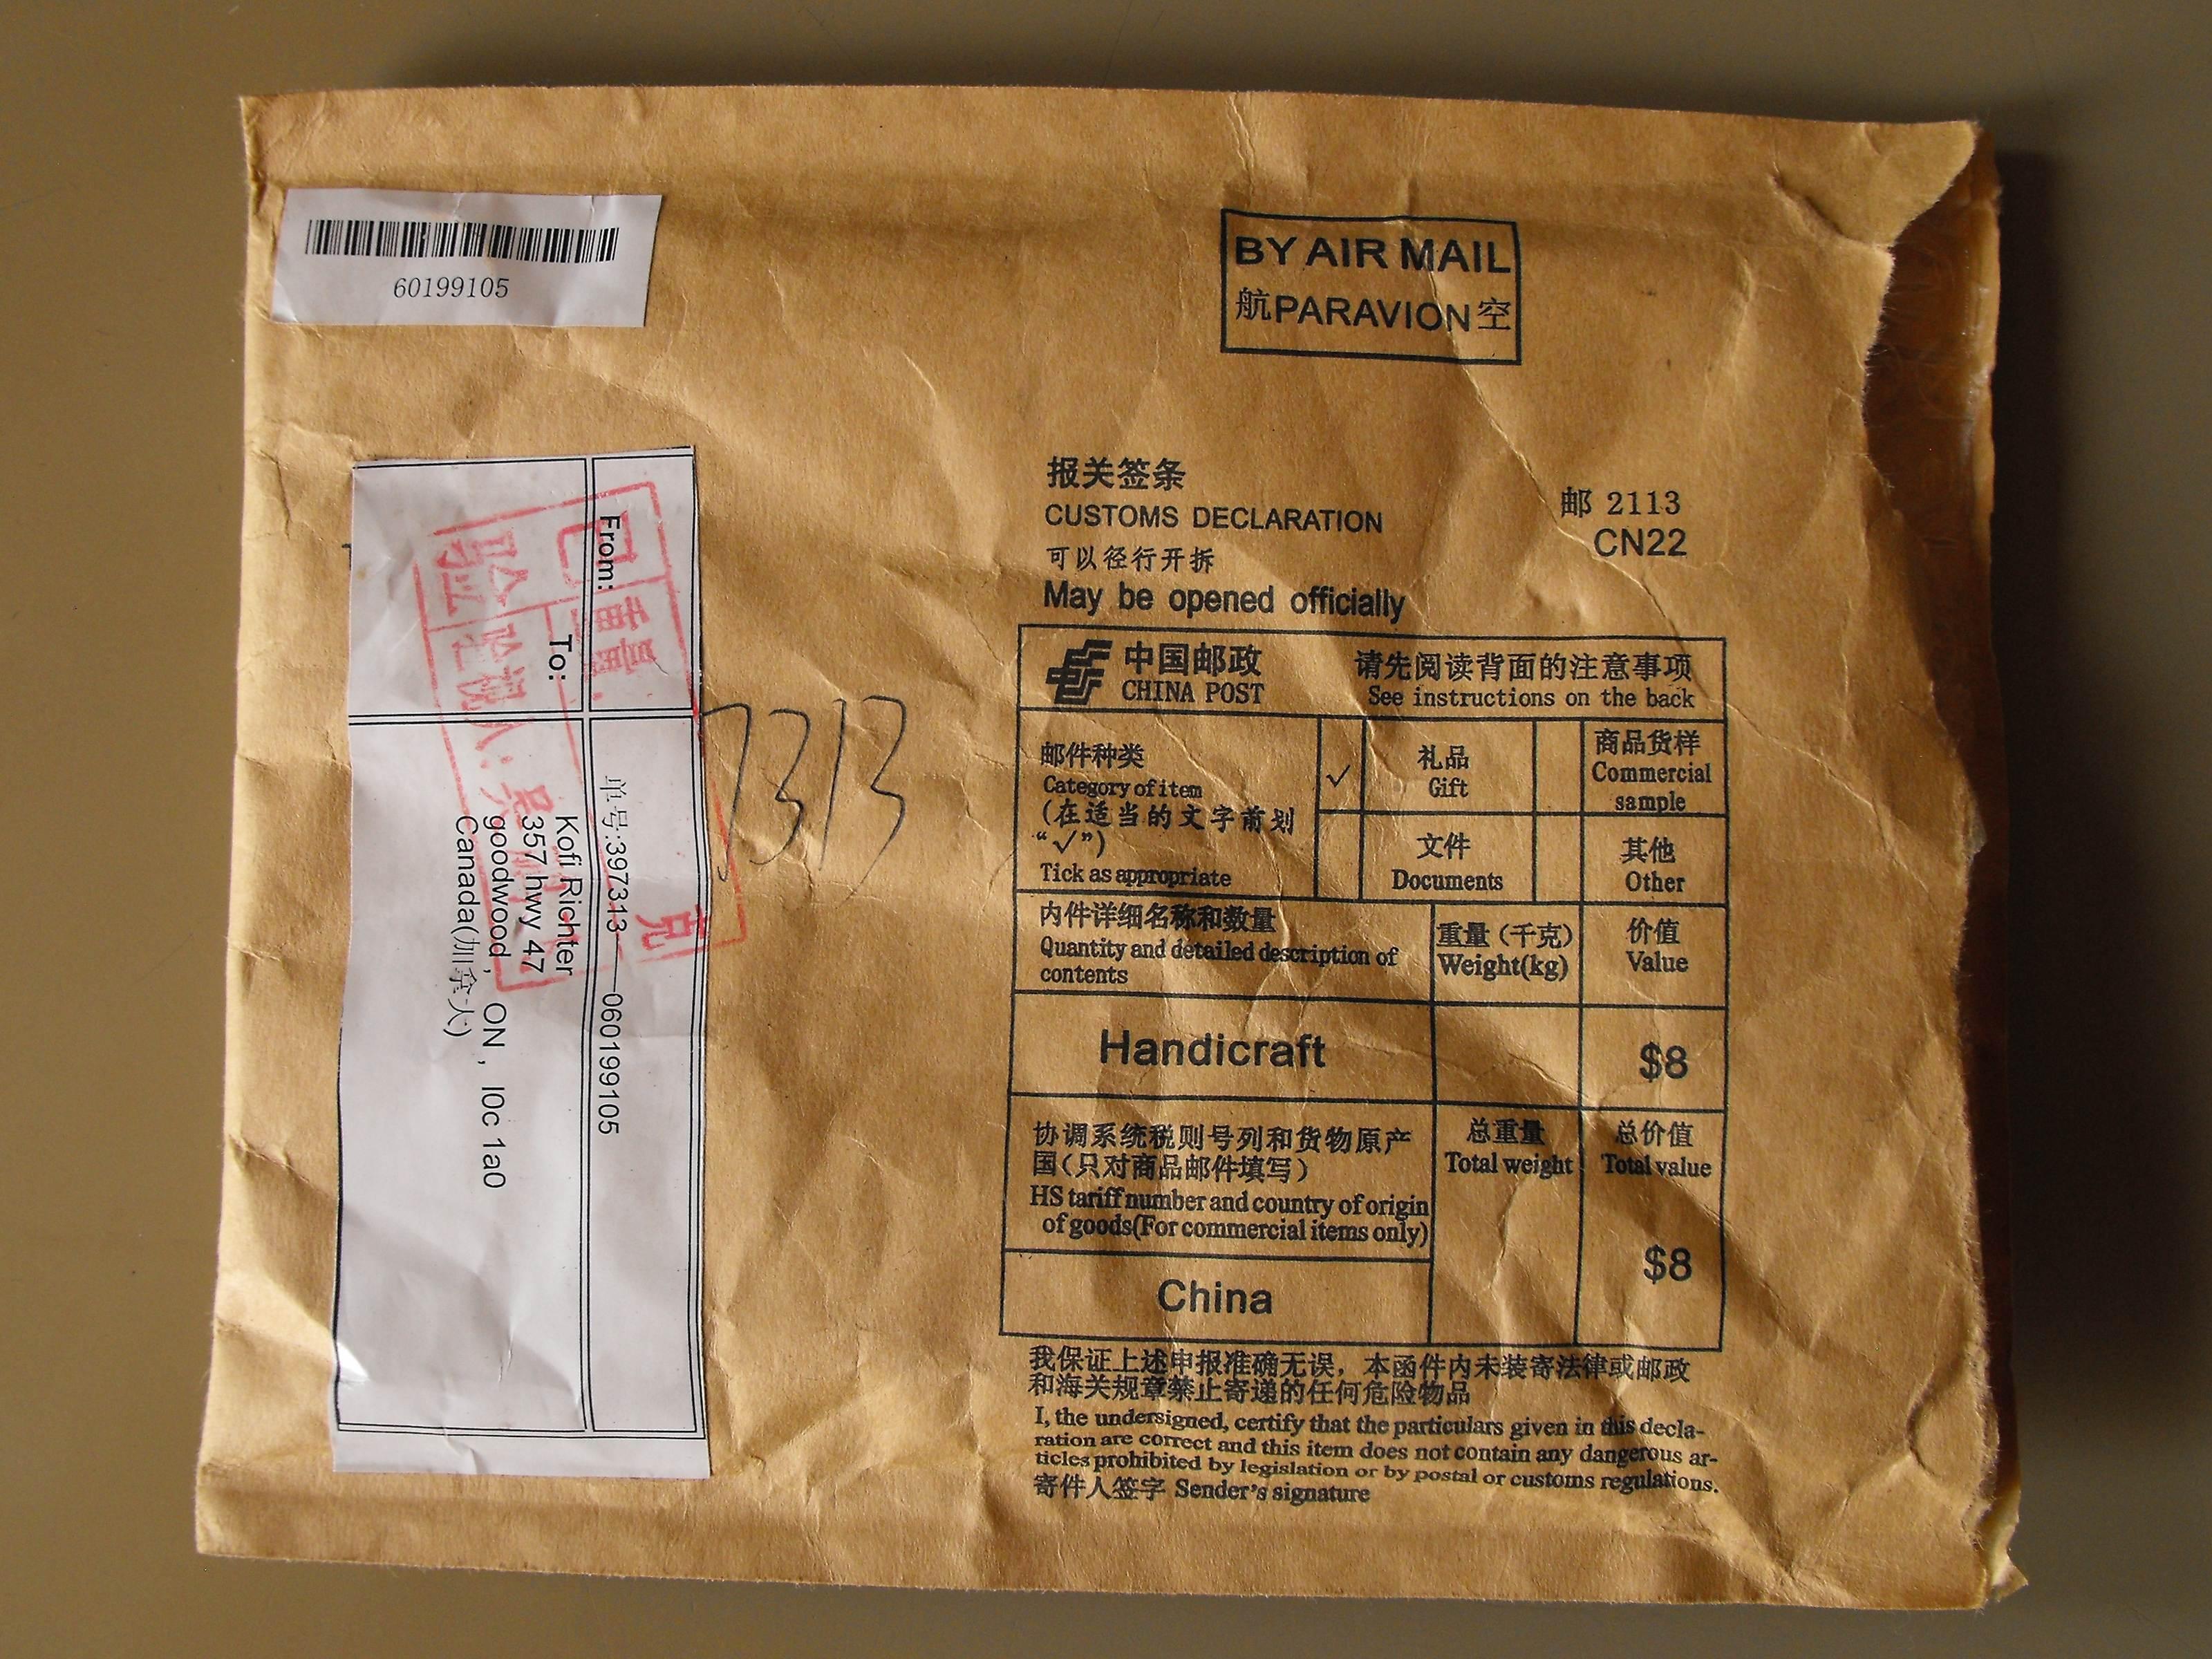 Postage Padded Envelope